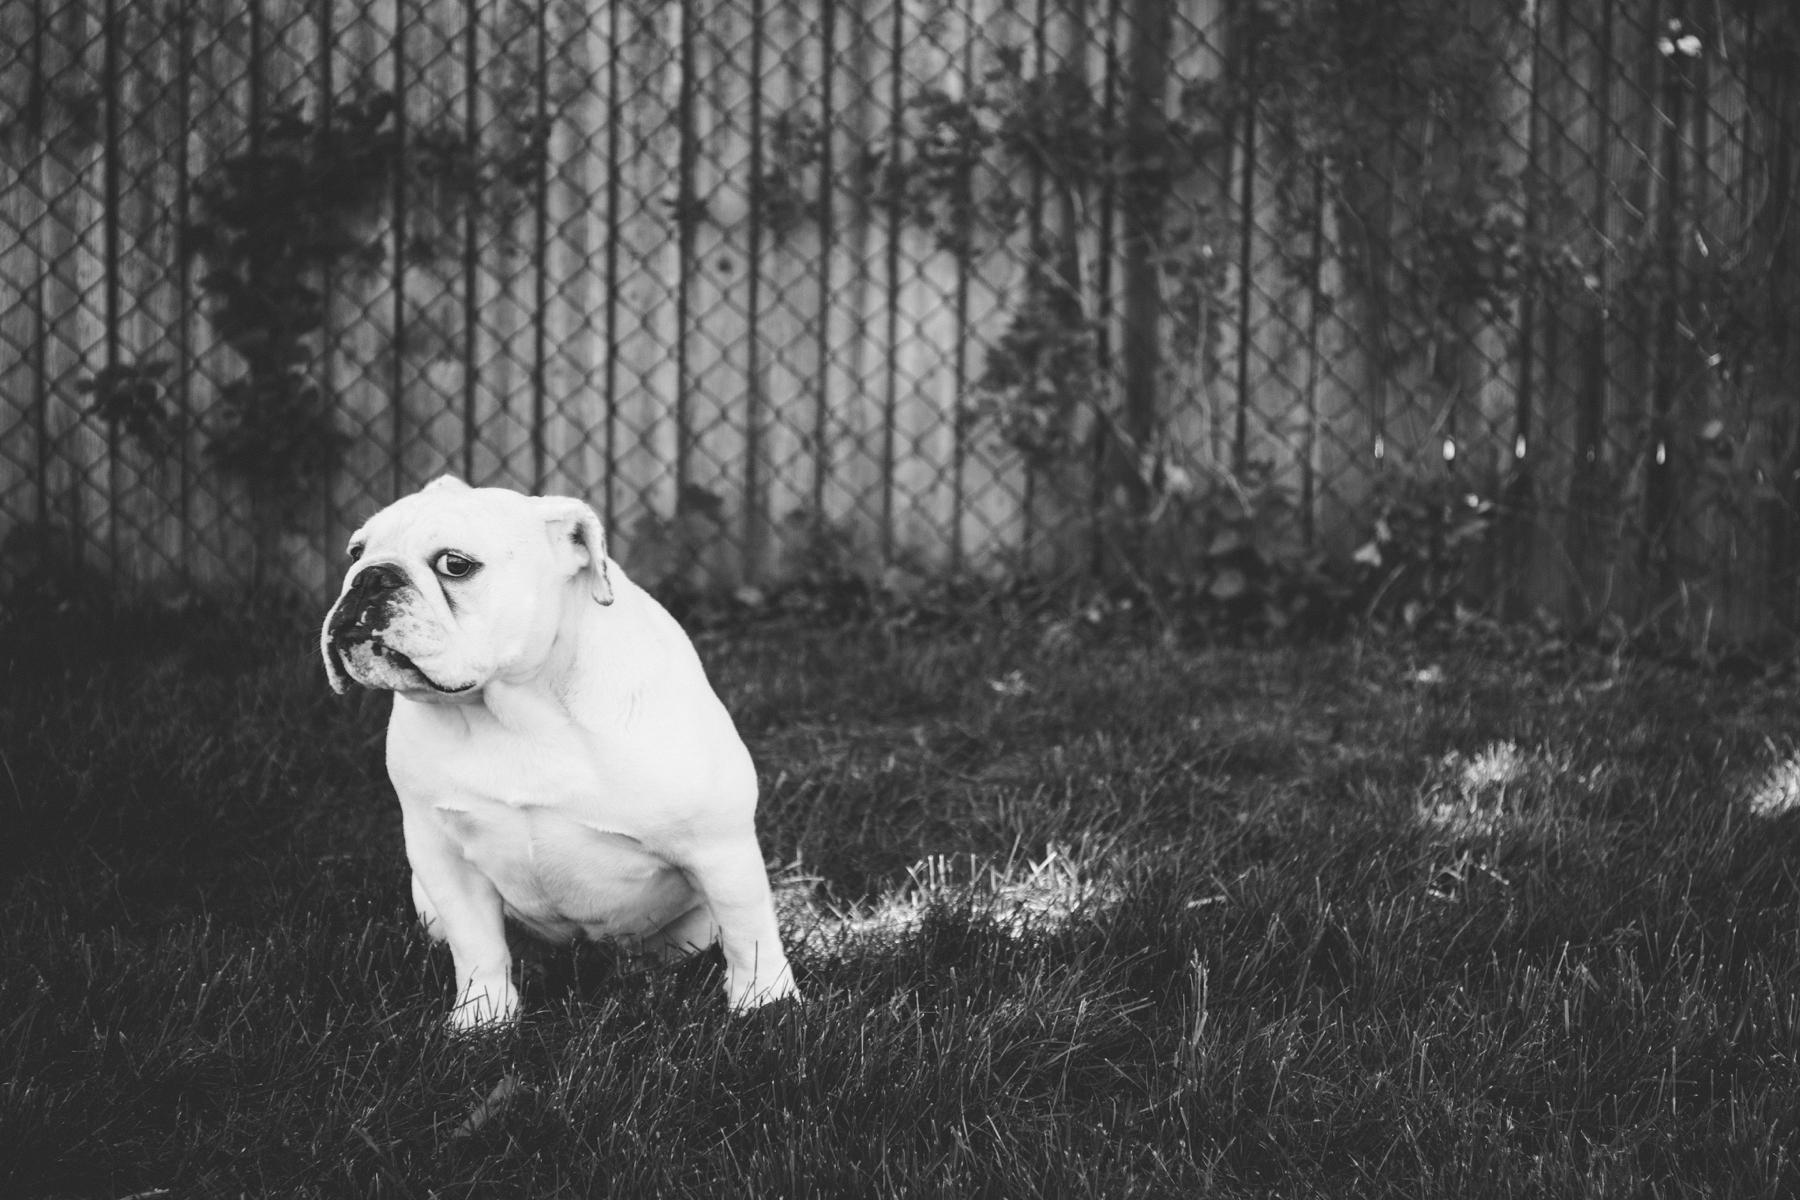 Brandon_Shafer_Photography_Zooey_EnglishBulldog_0007.jpg